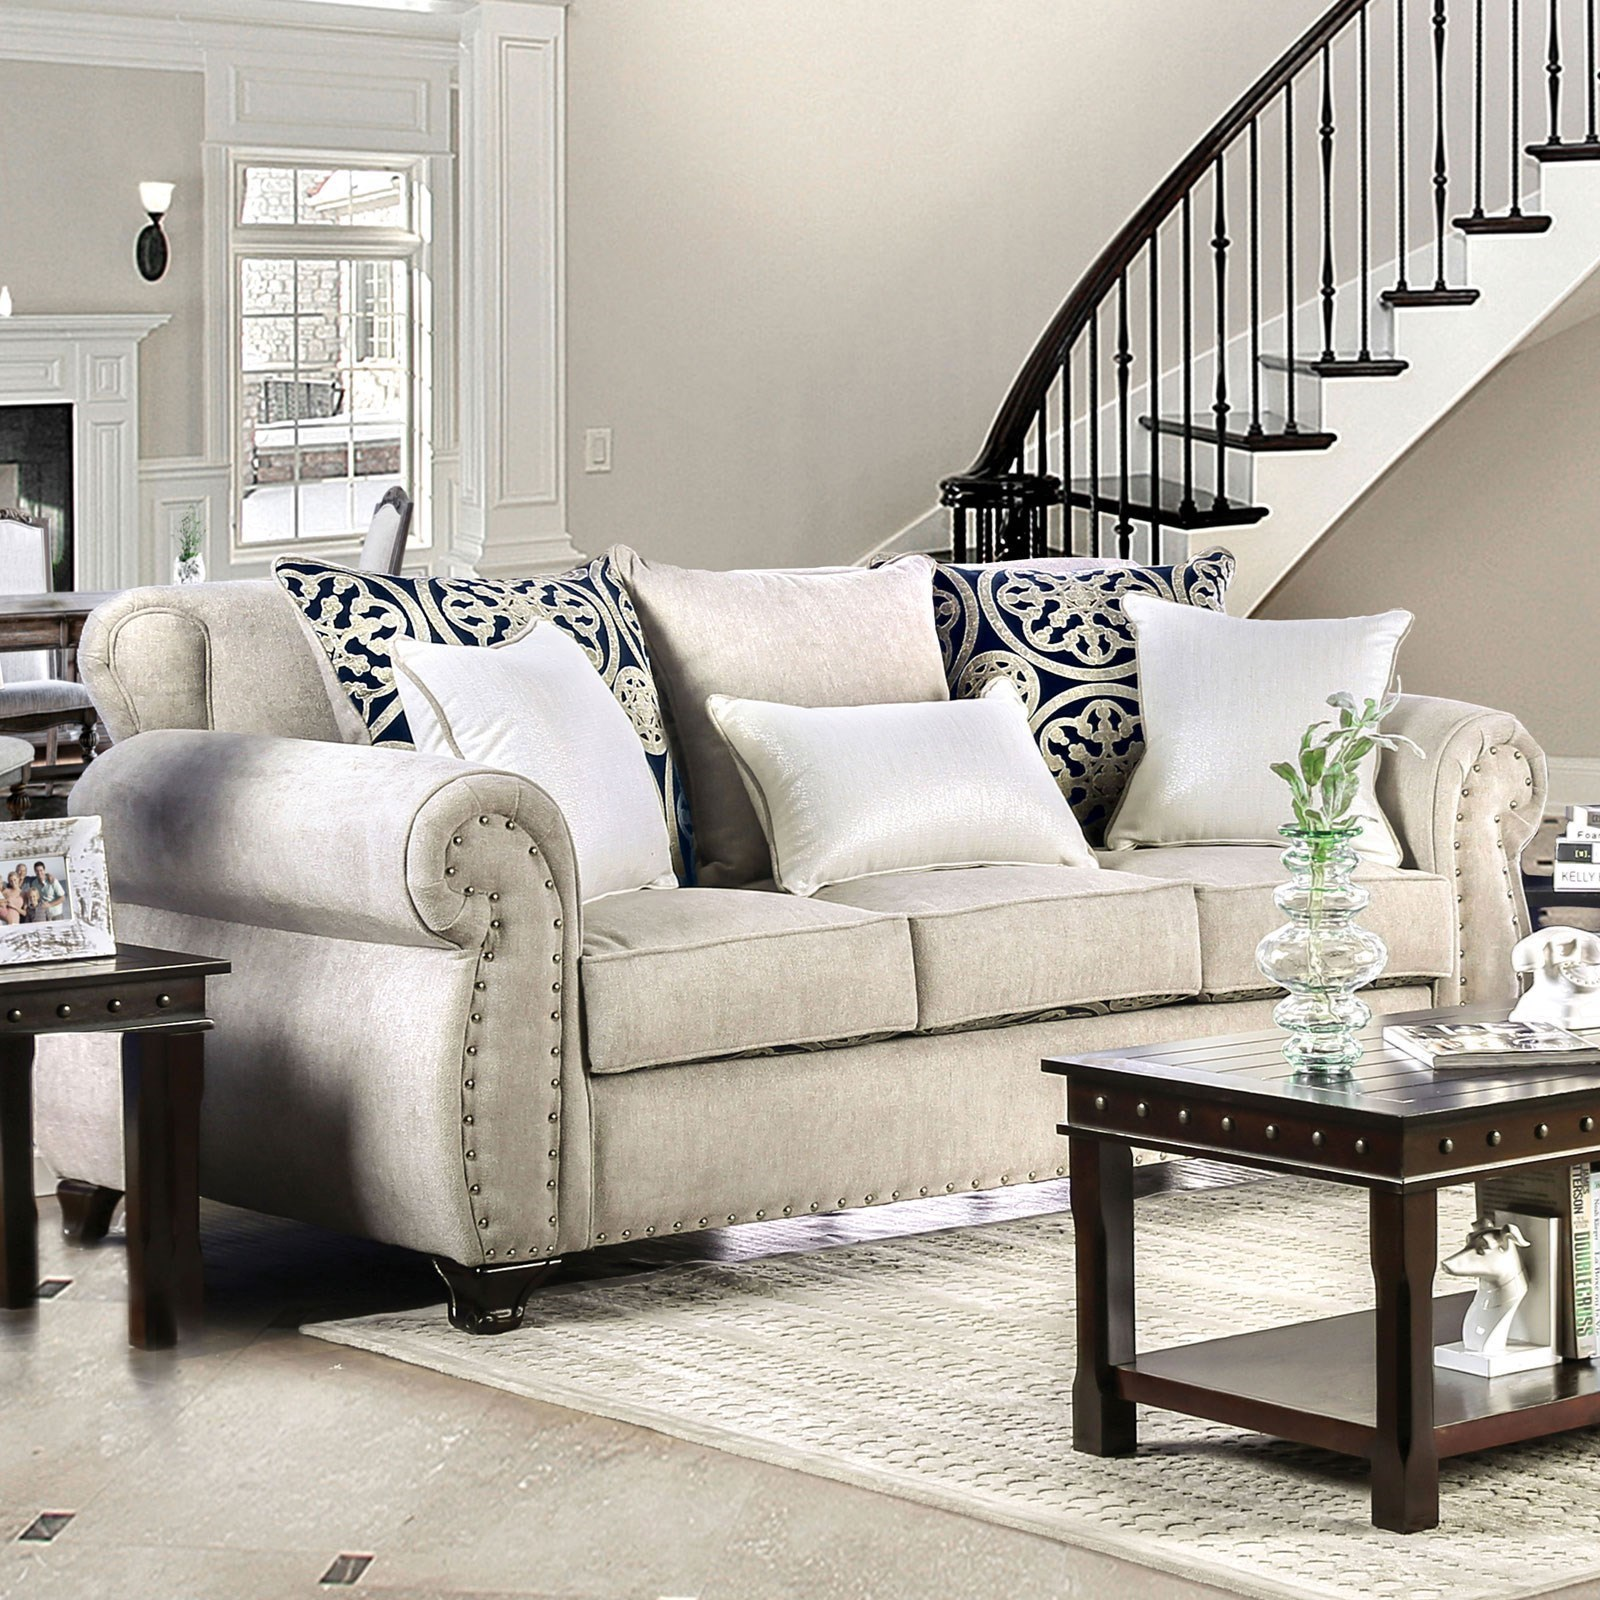 Sinatra Sofa at Household Furniture